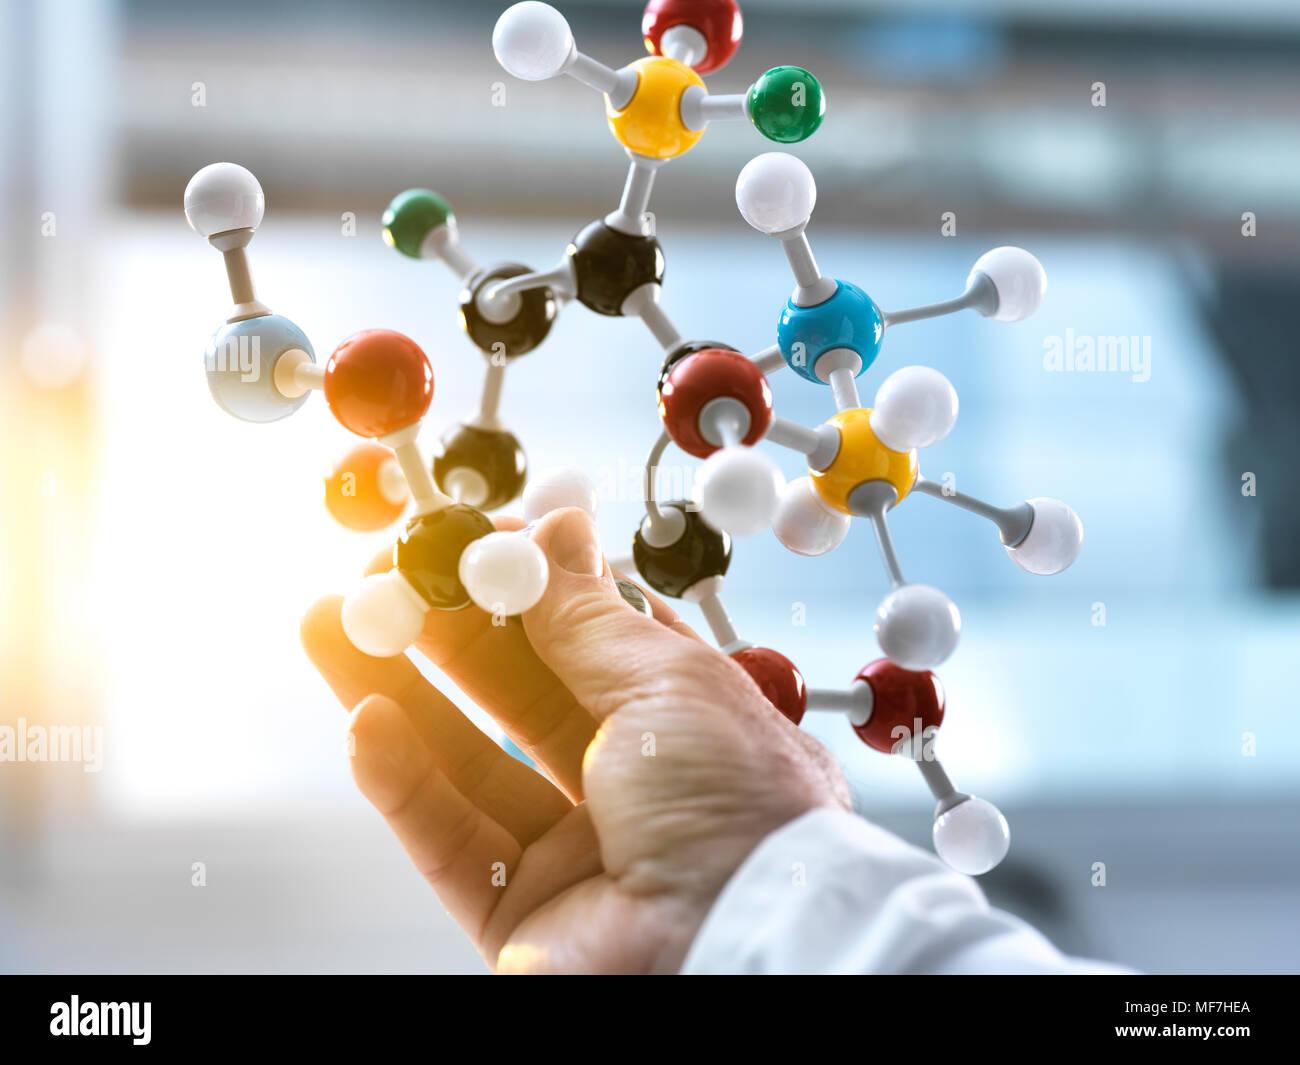 Scientist holding a molecular model - Stock Image